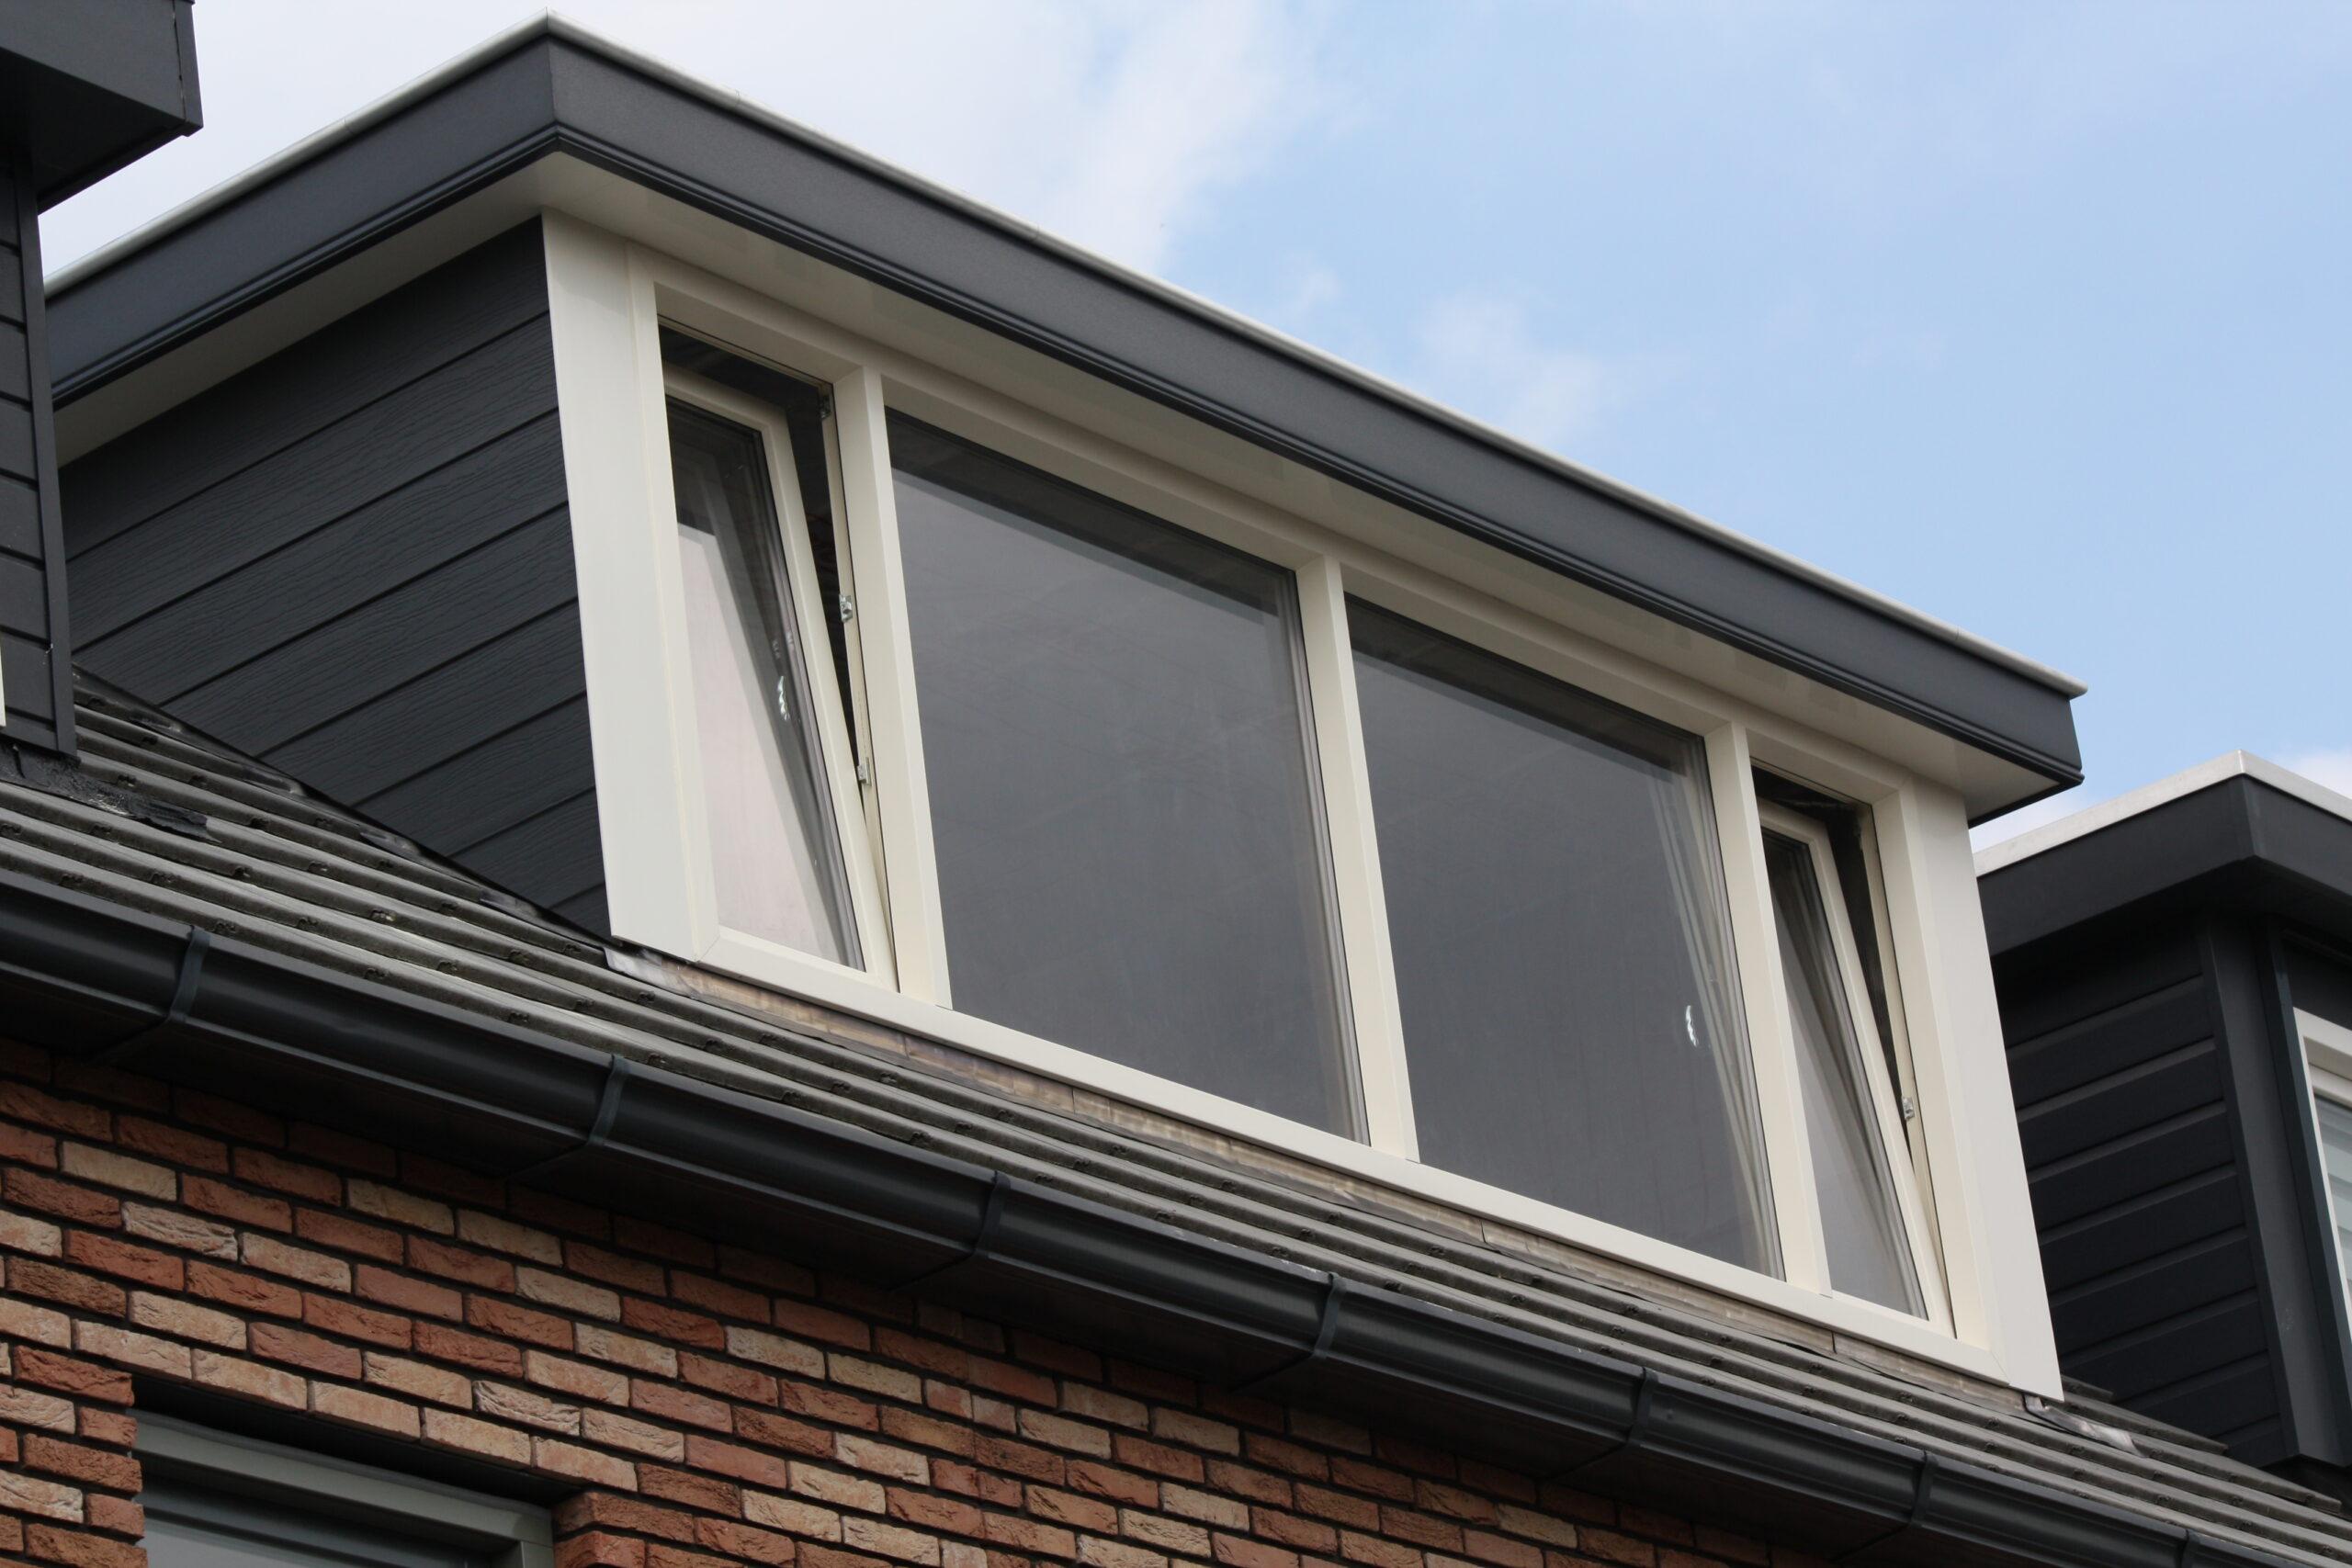 Dakalux - Daglichten-nl - Dakraam - Dakkapel - Lichtkoepel - Roto - Velux - Fakro - Keylite